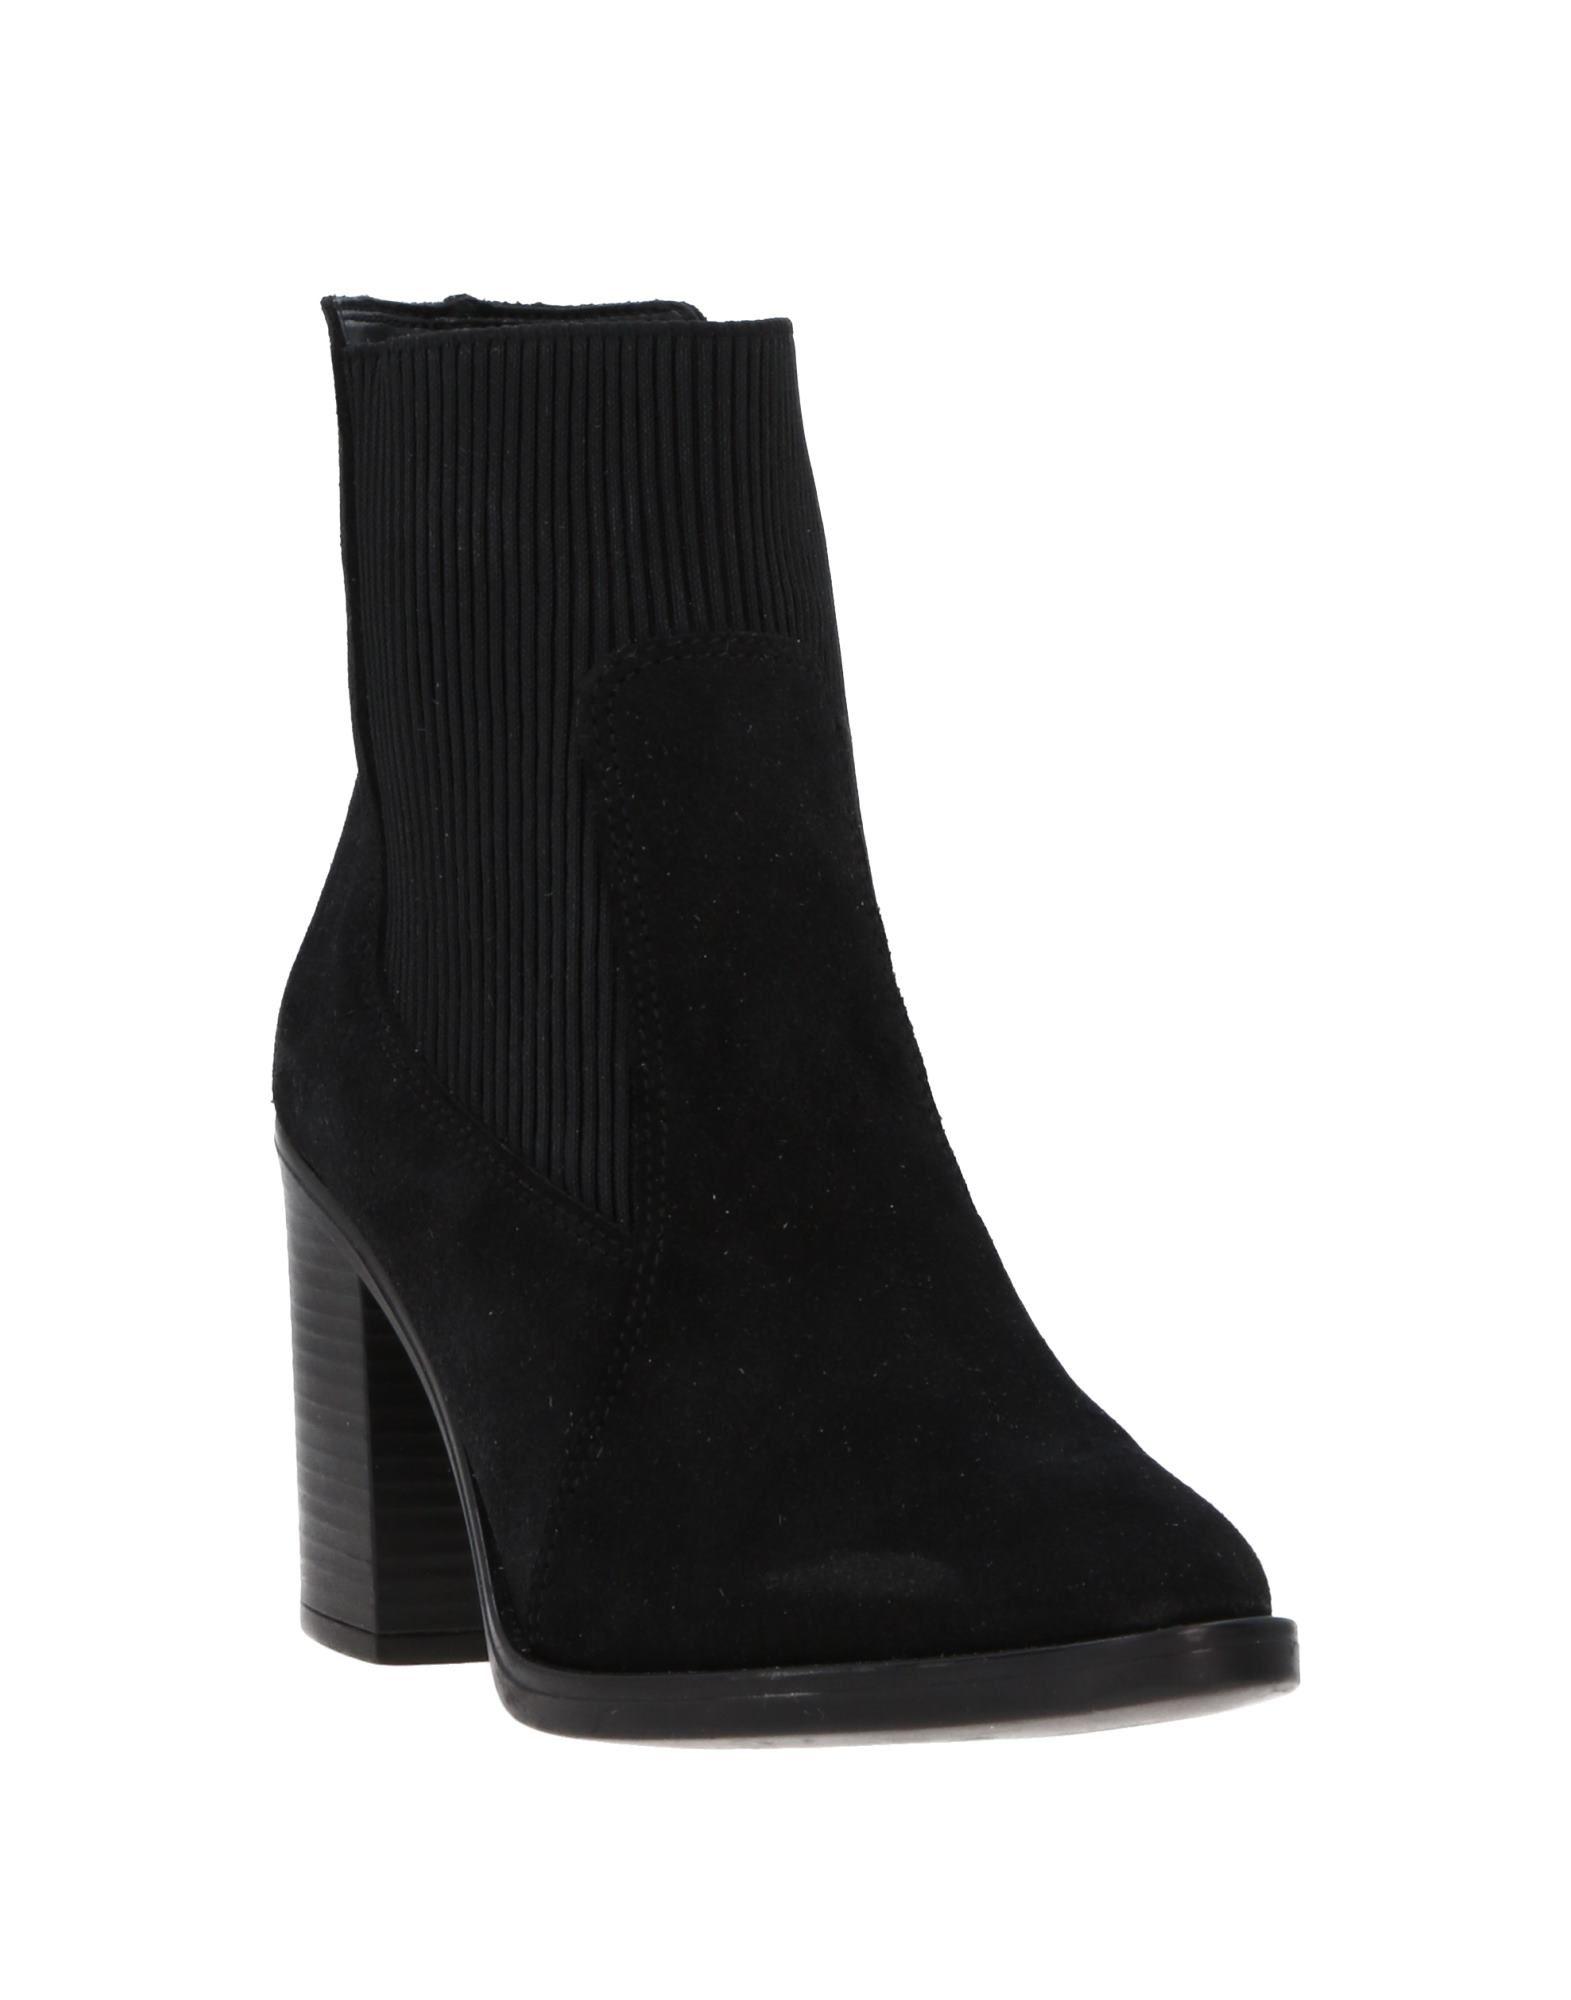 Gut um Stiefelette billige Schuhe zu tragenCarlo Pazolini Stiefelette um Damen  11519224KI eab4e2